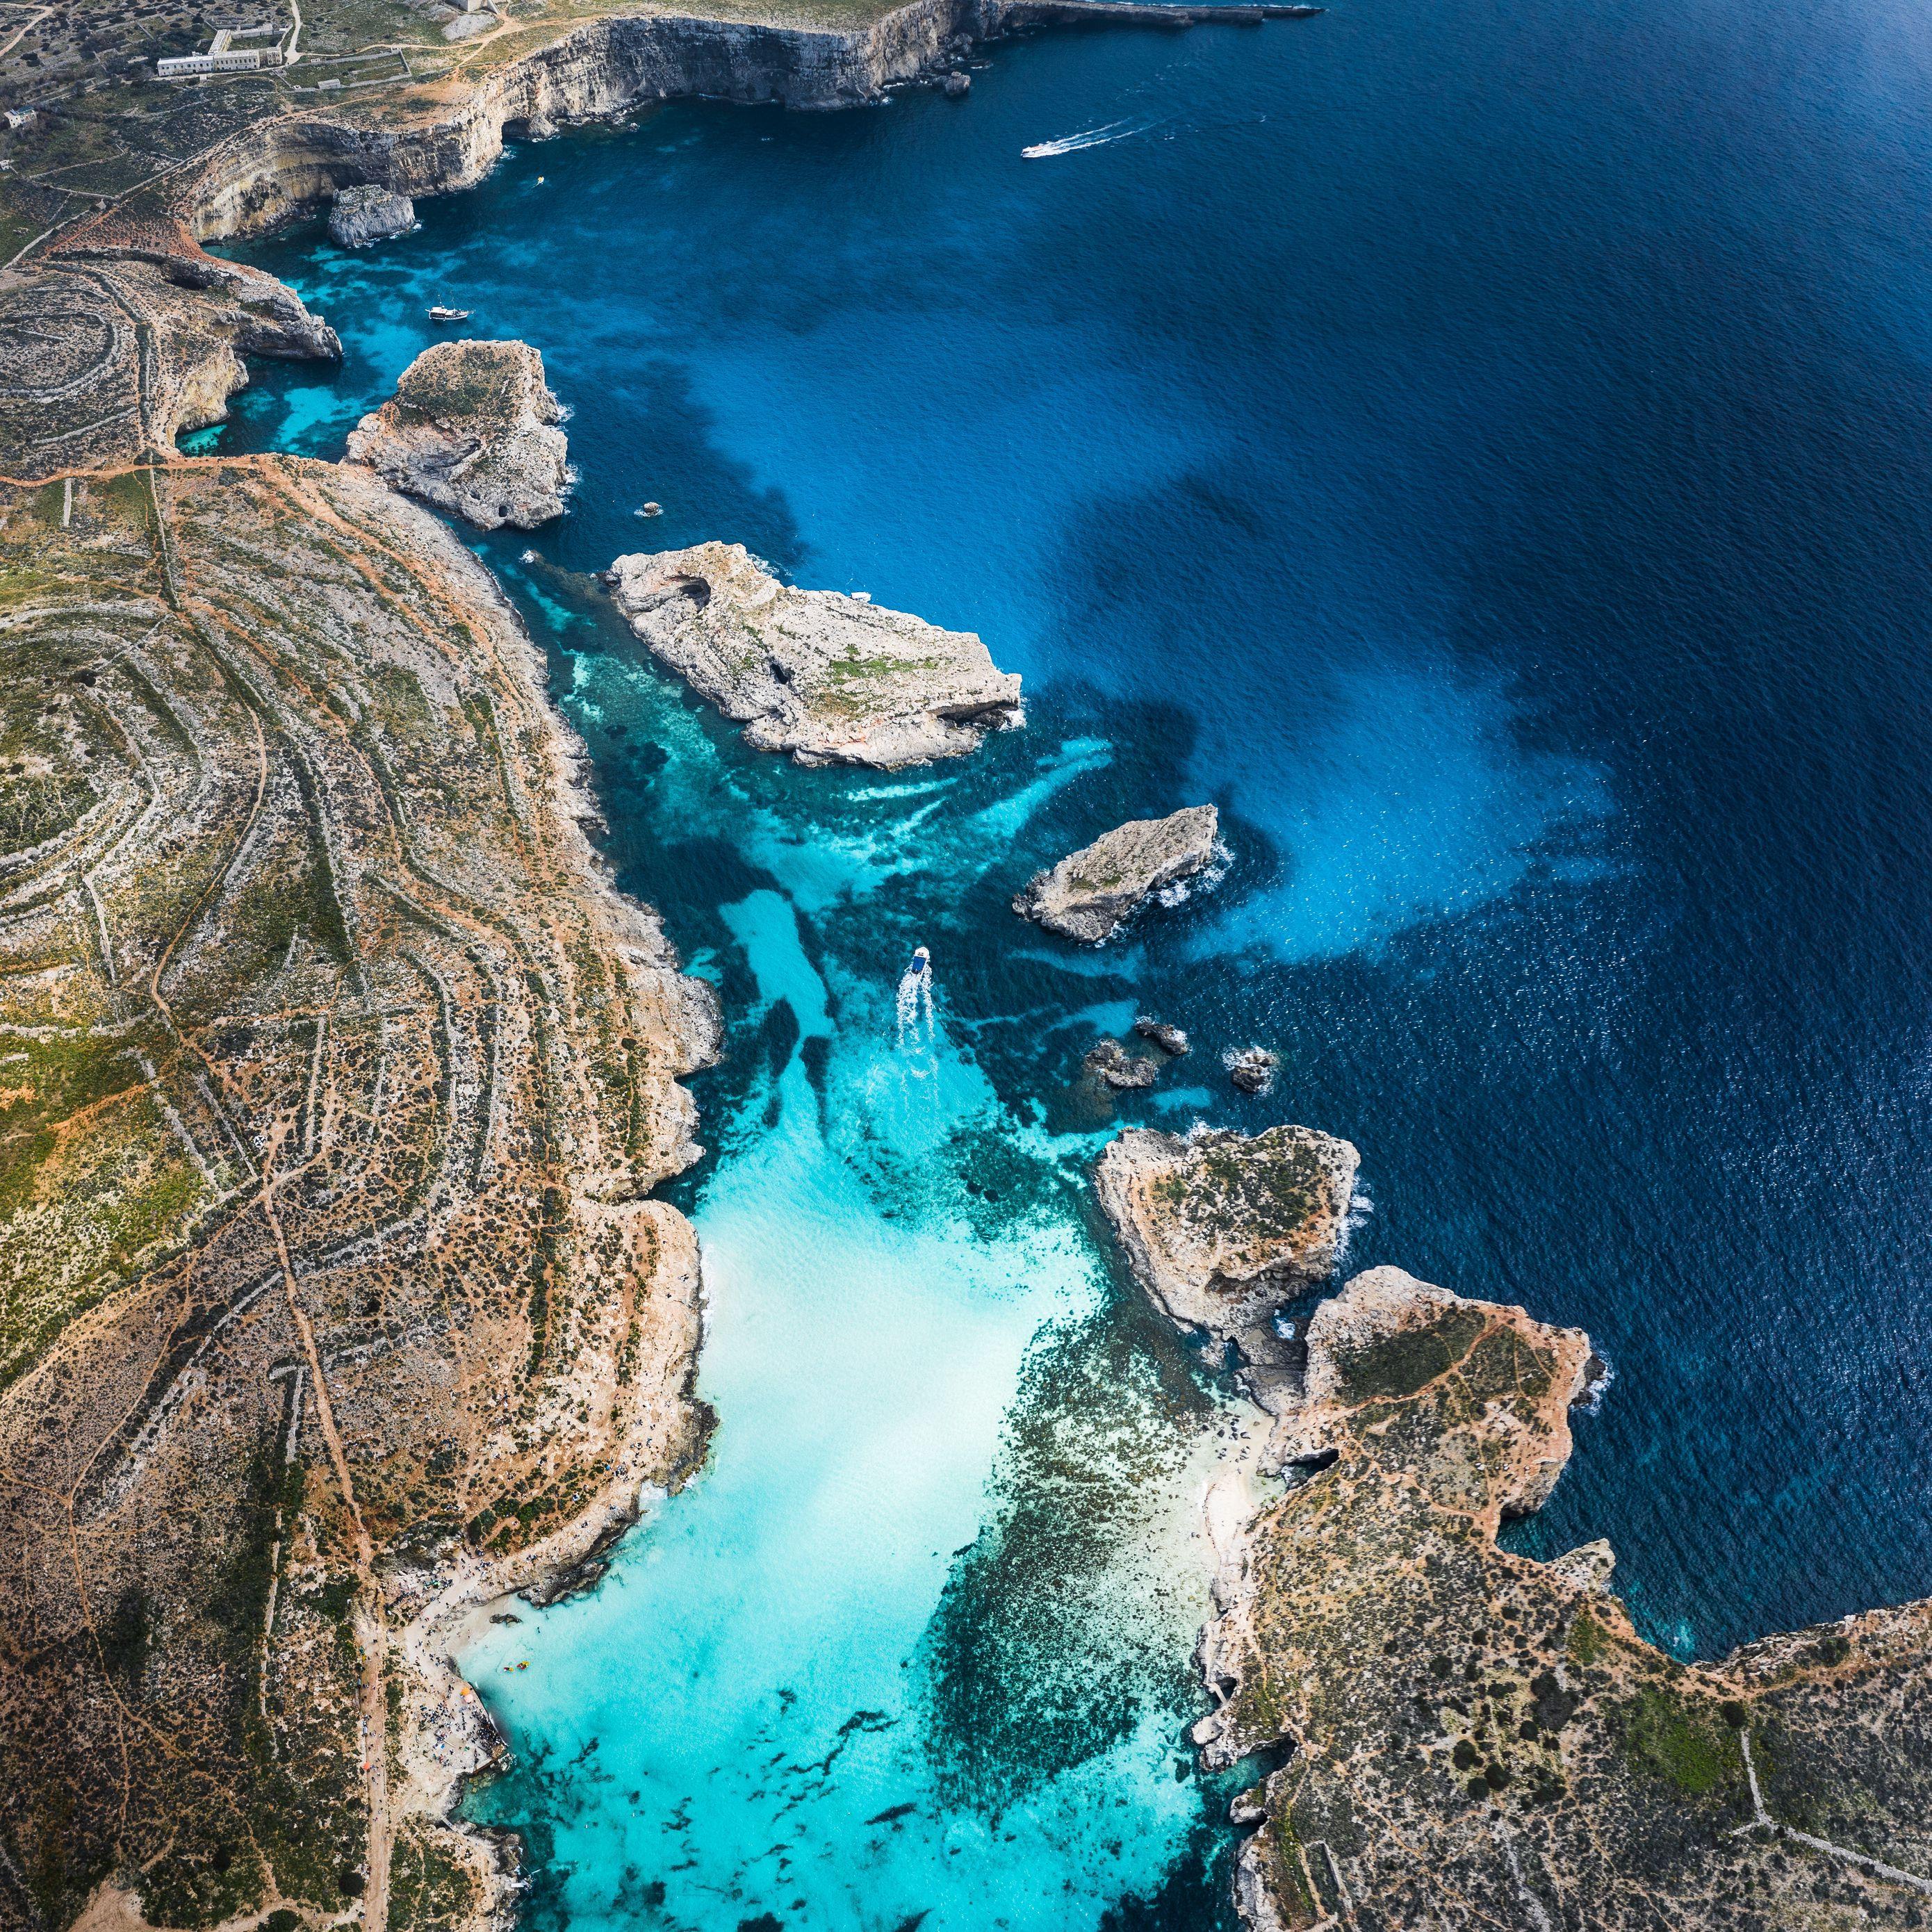 Download wallpaper 2780x2780 bay coast stony ocean island 2780x2780